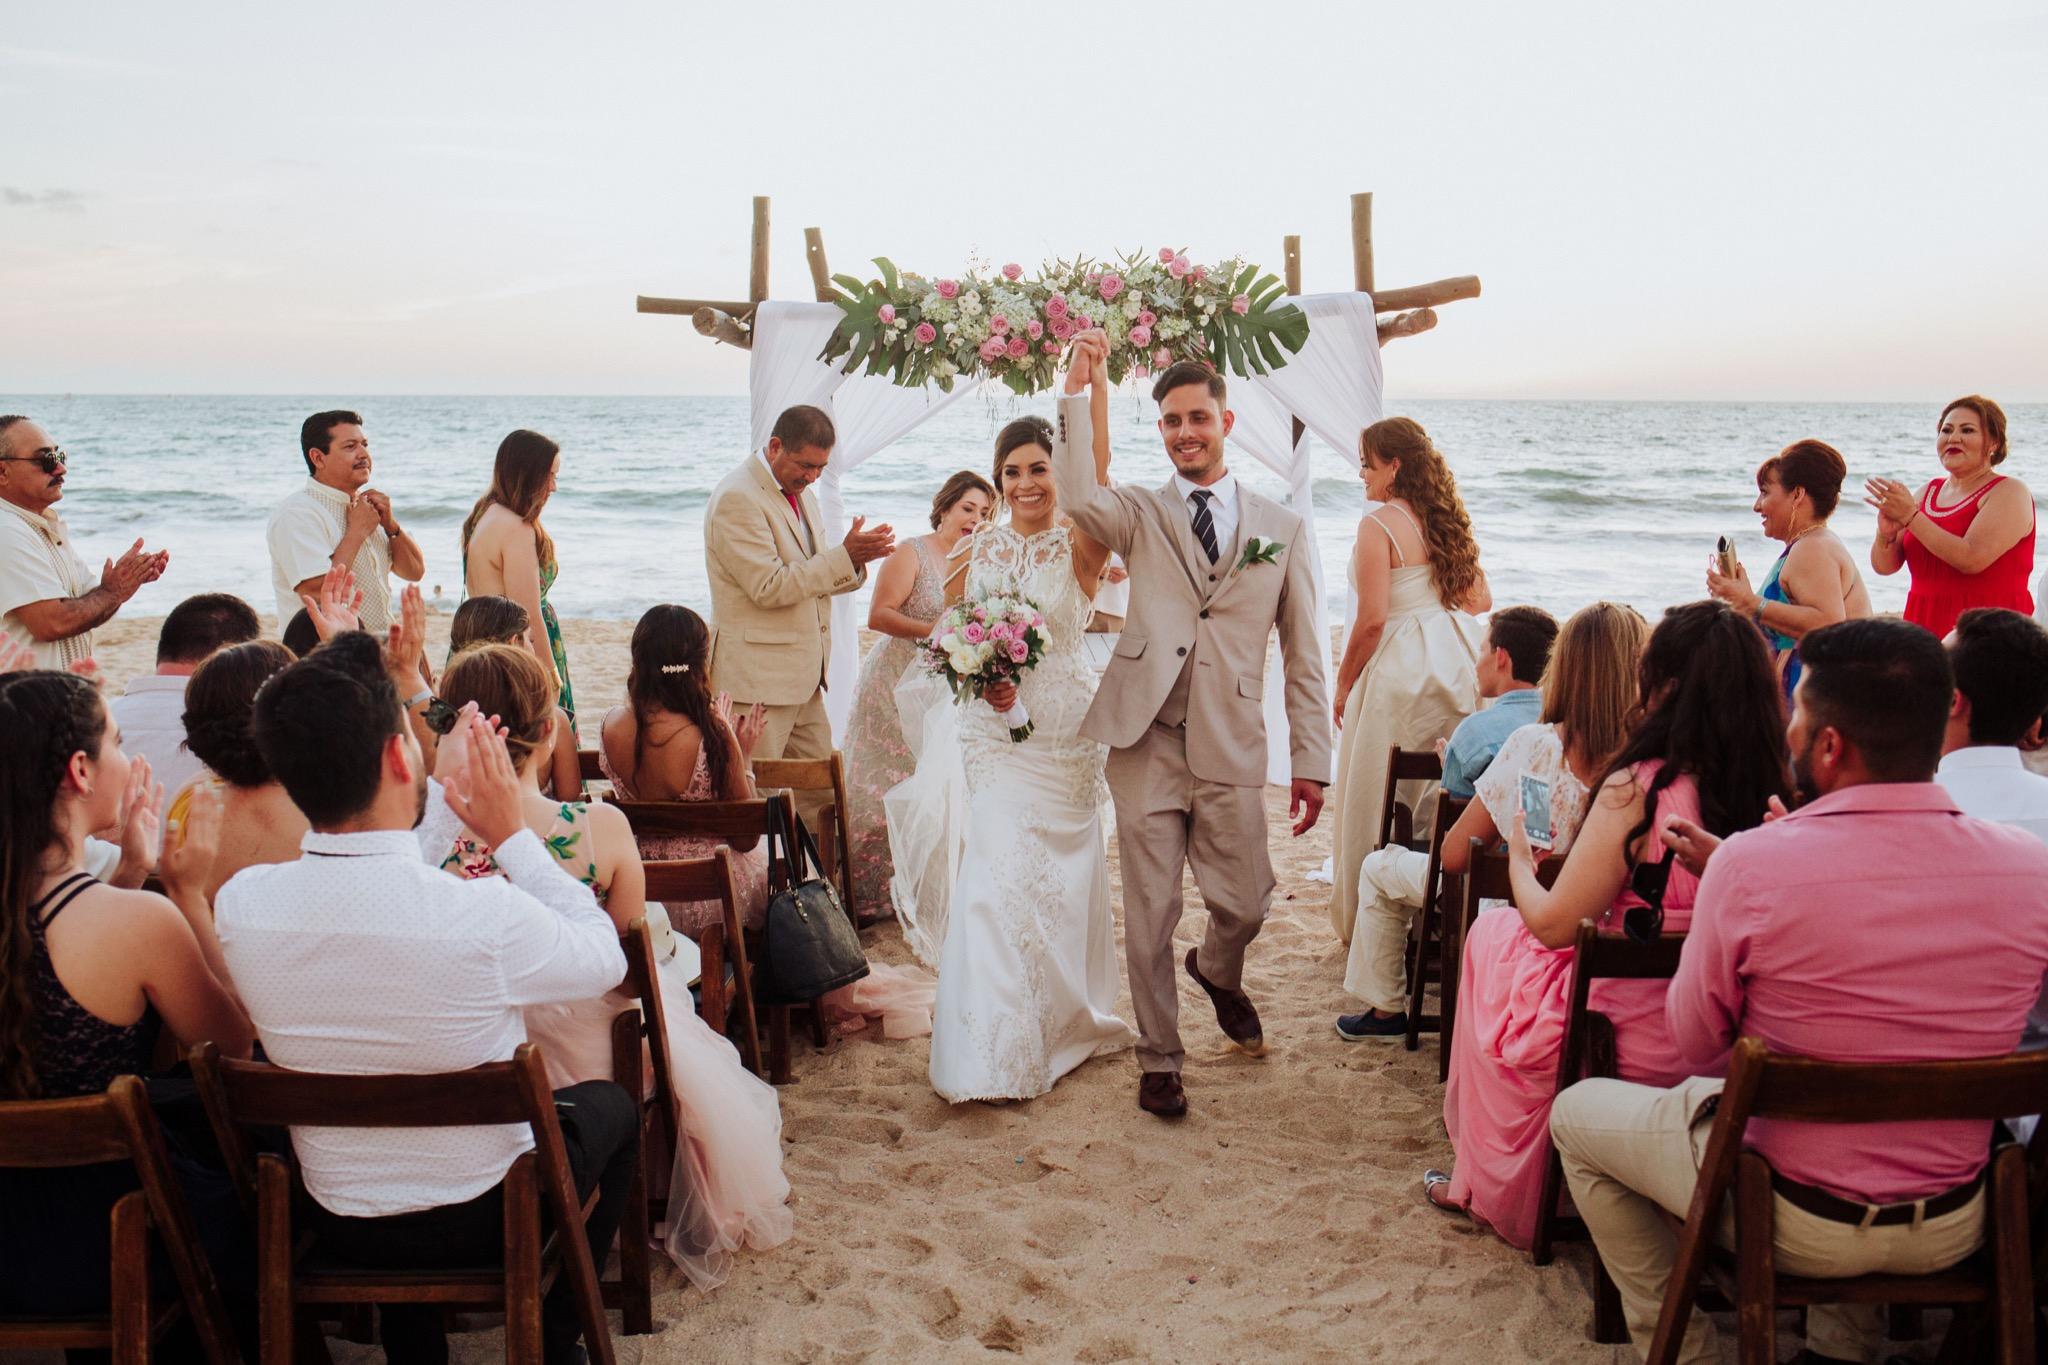 Javier_noriega_fotografo_bodas_profesional_zacatecas_mexico_mazatlan_sinaloa_photographer_weddings64